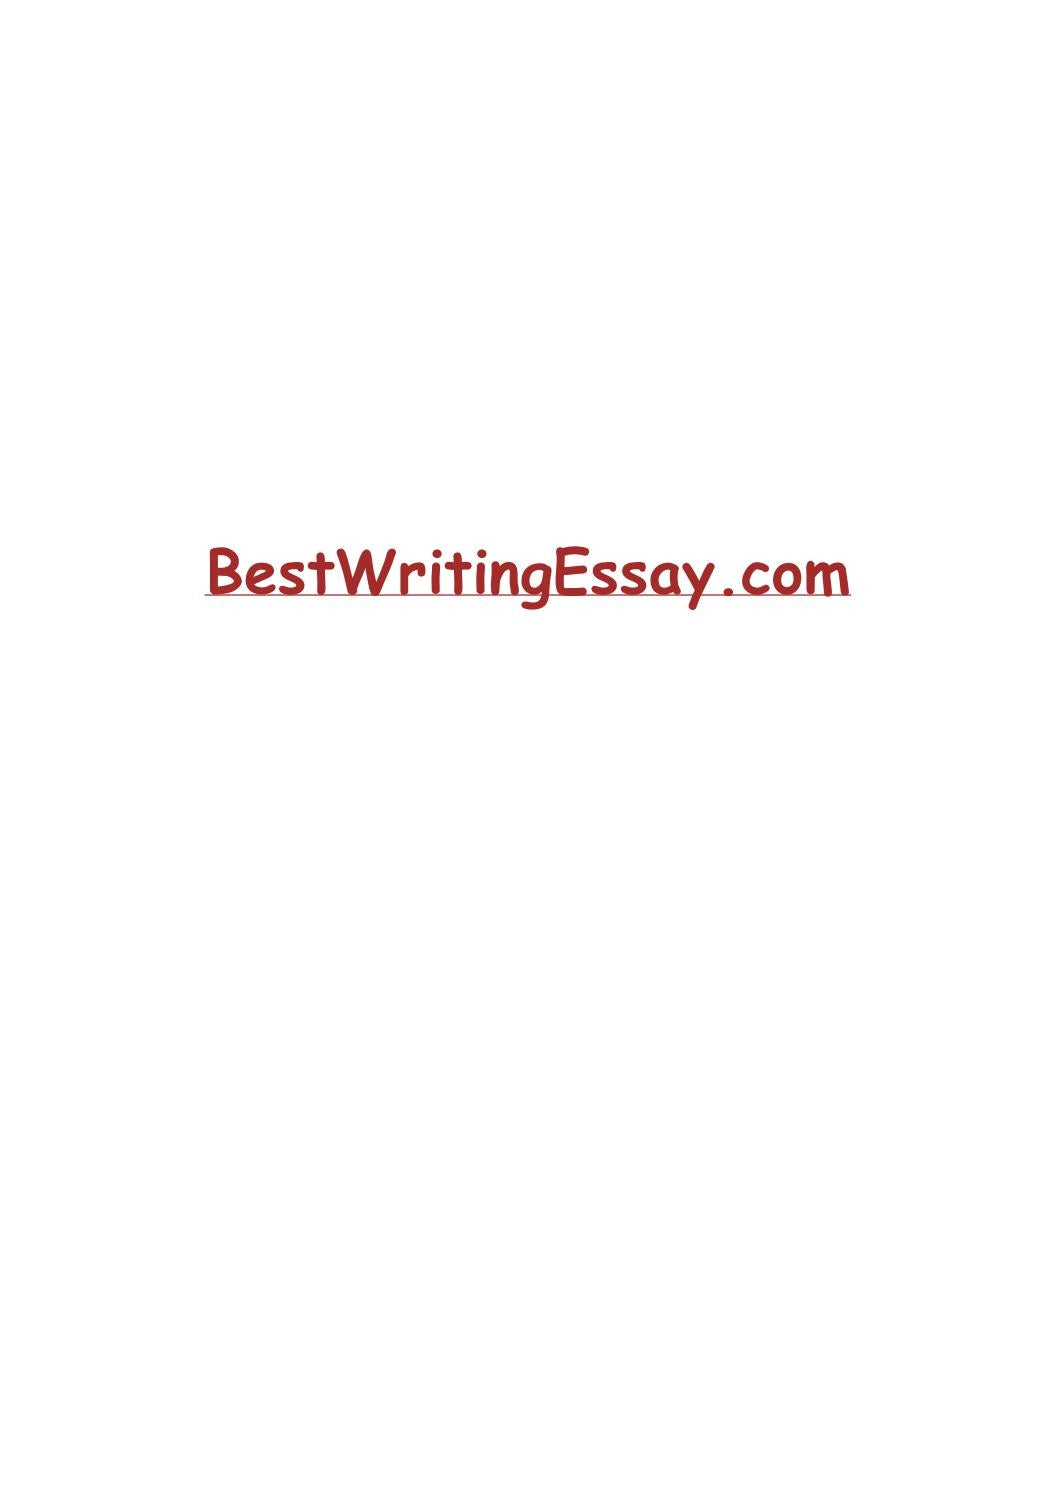 Bibliography market ideas for sale cheap